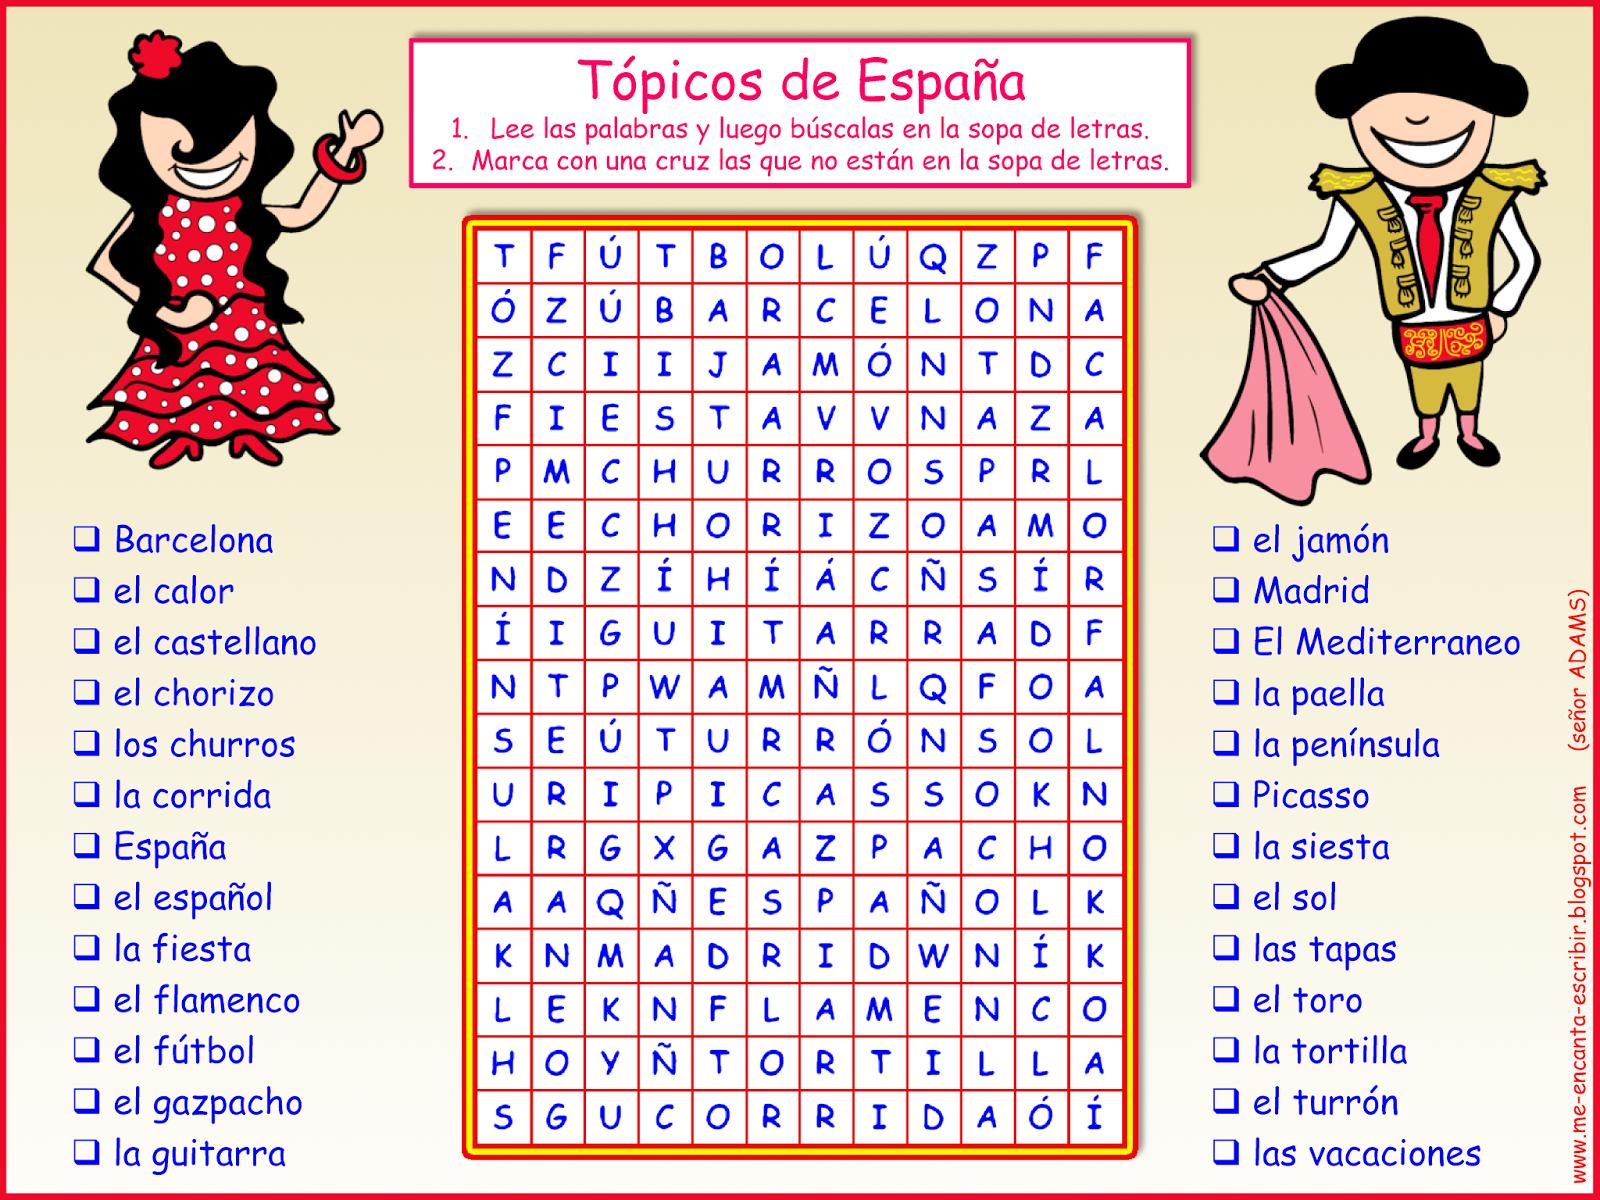 letras de kiss en espanol: